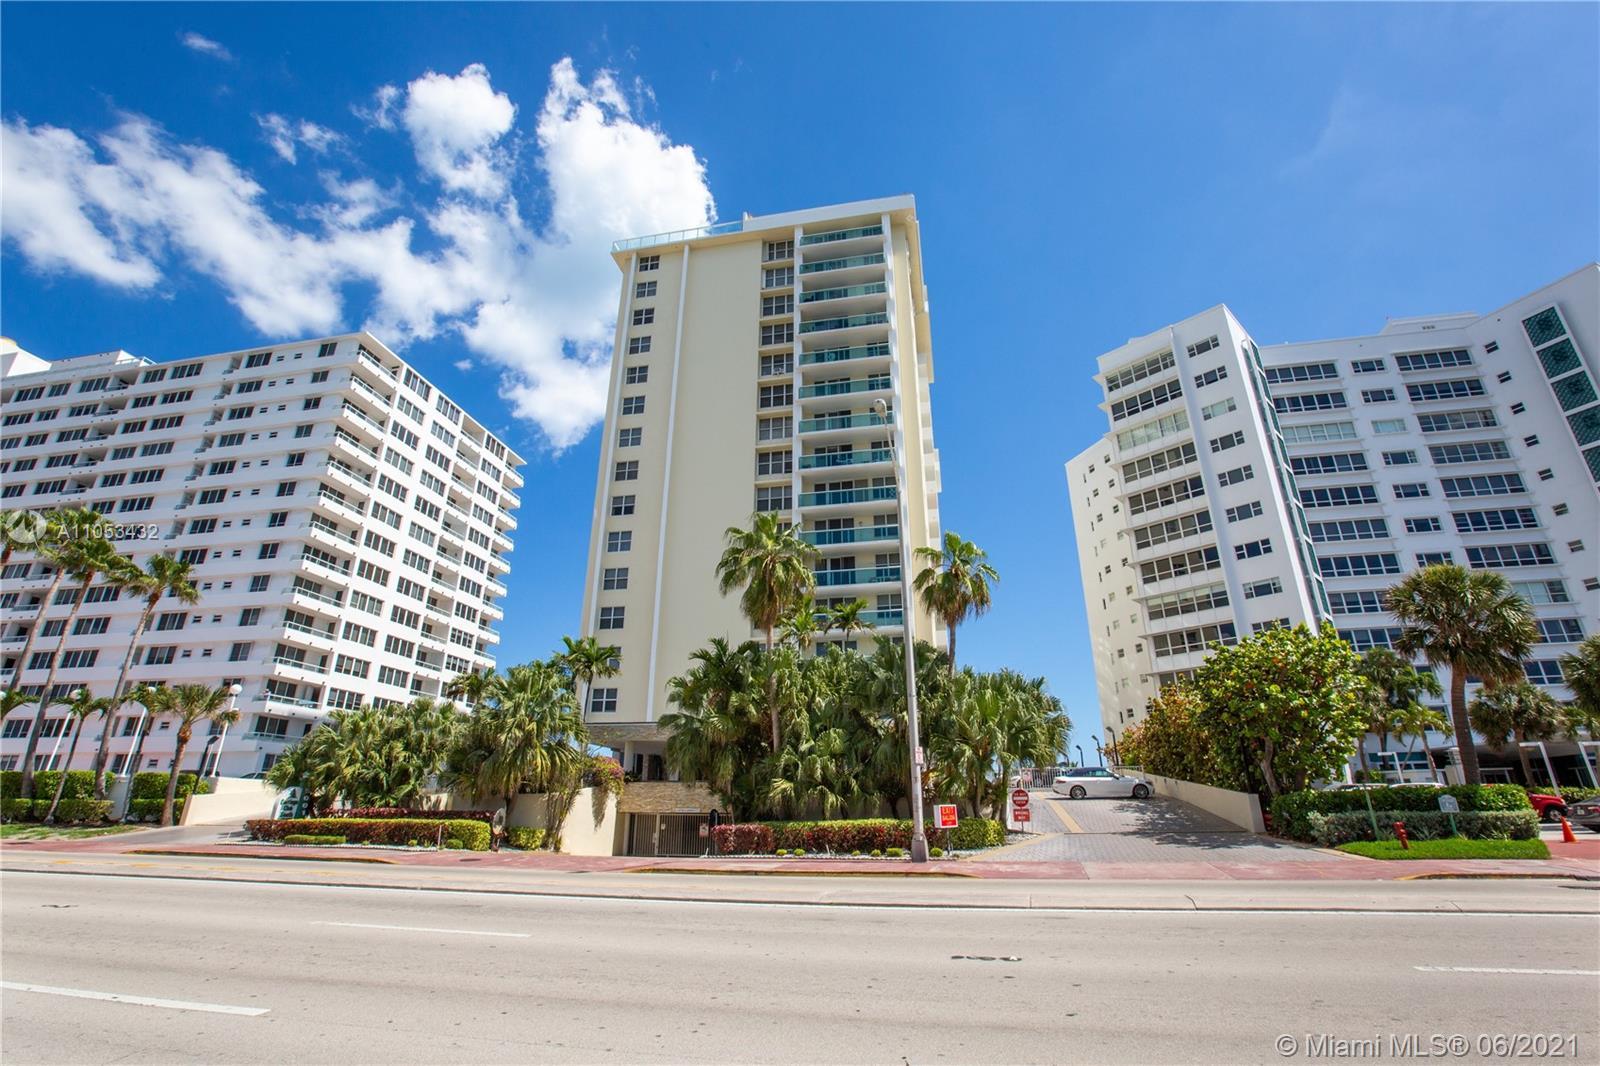 Carriage Club South Tower #12C - 5001 Collins Ave #12C, Miami Beach, FL 33140